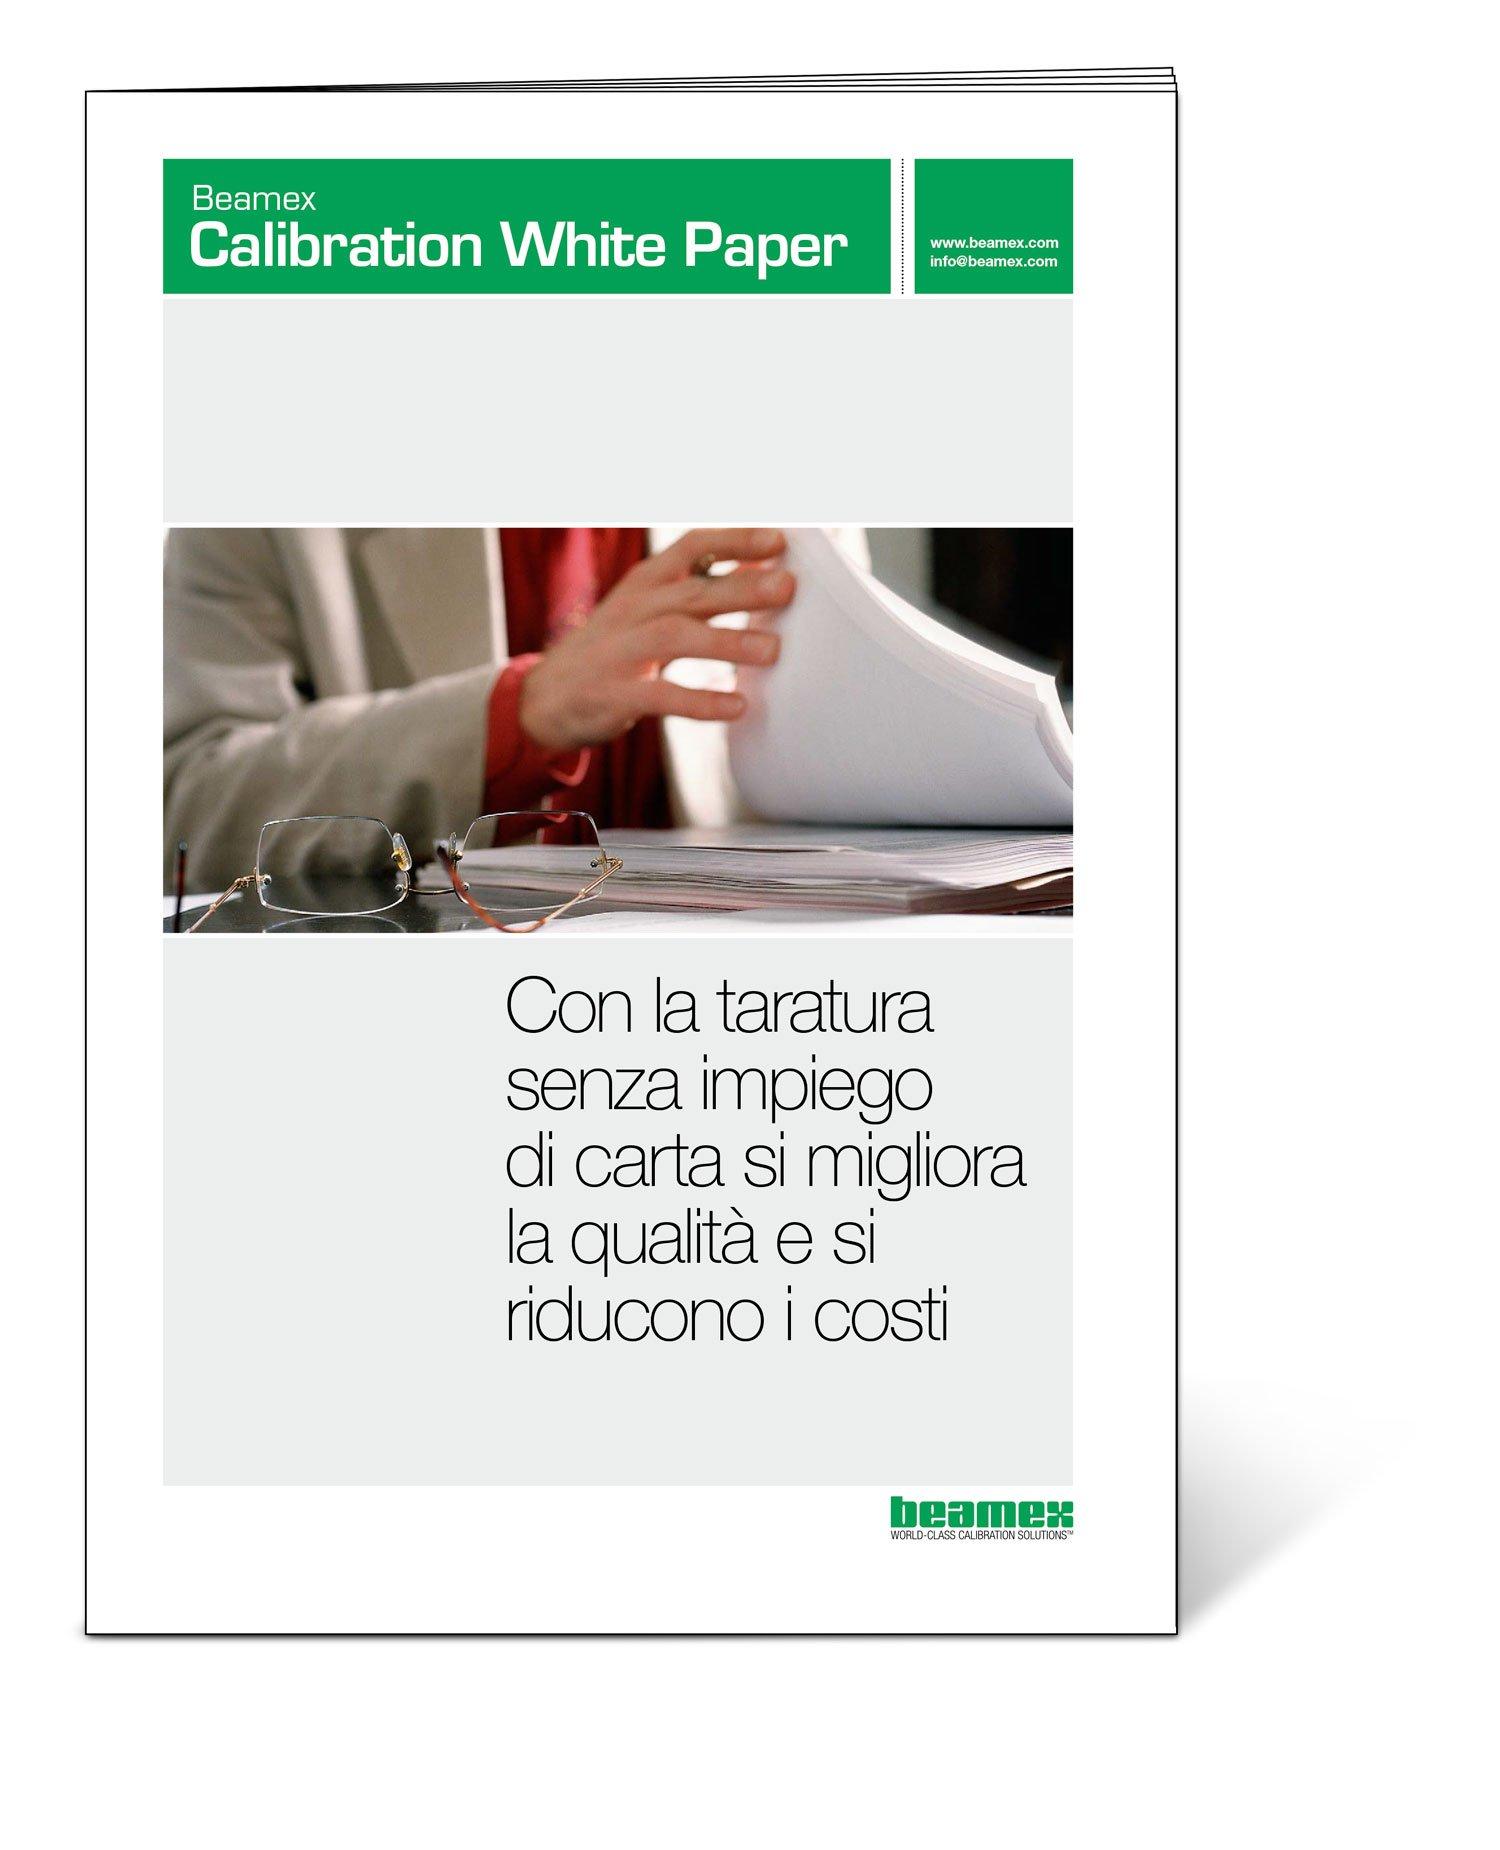 Beamex-WP-Paperless-calibration-1500px-v1_ITA